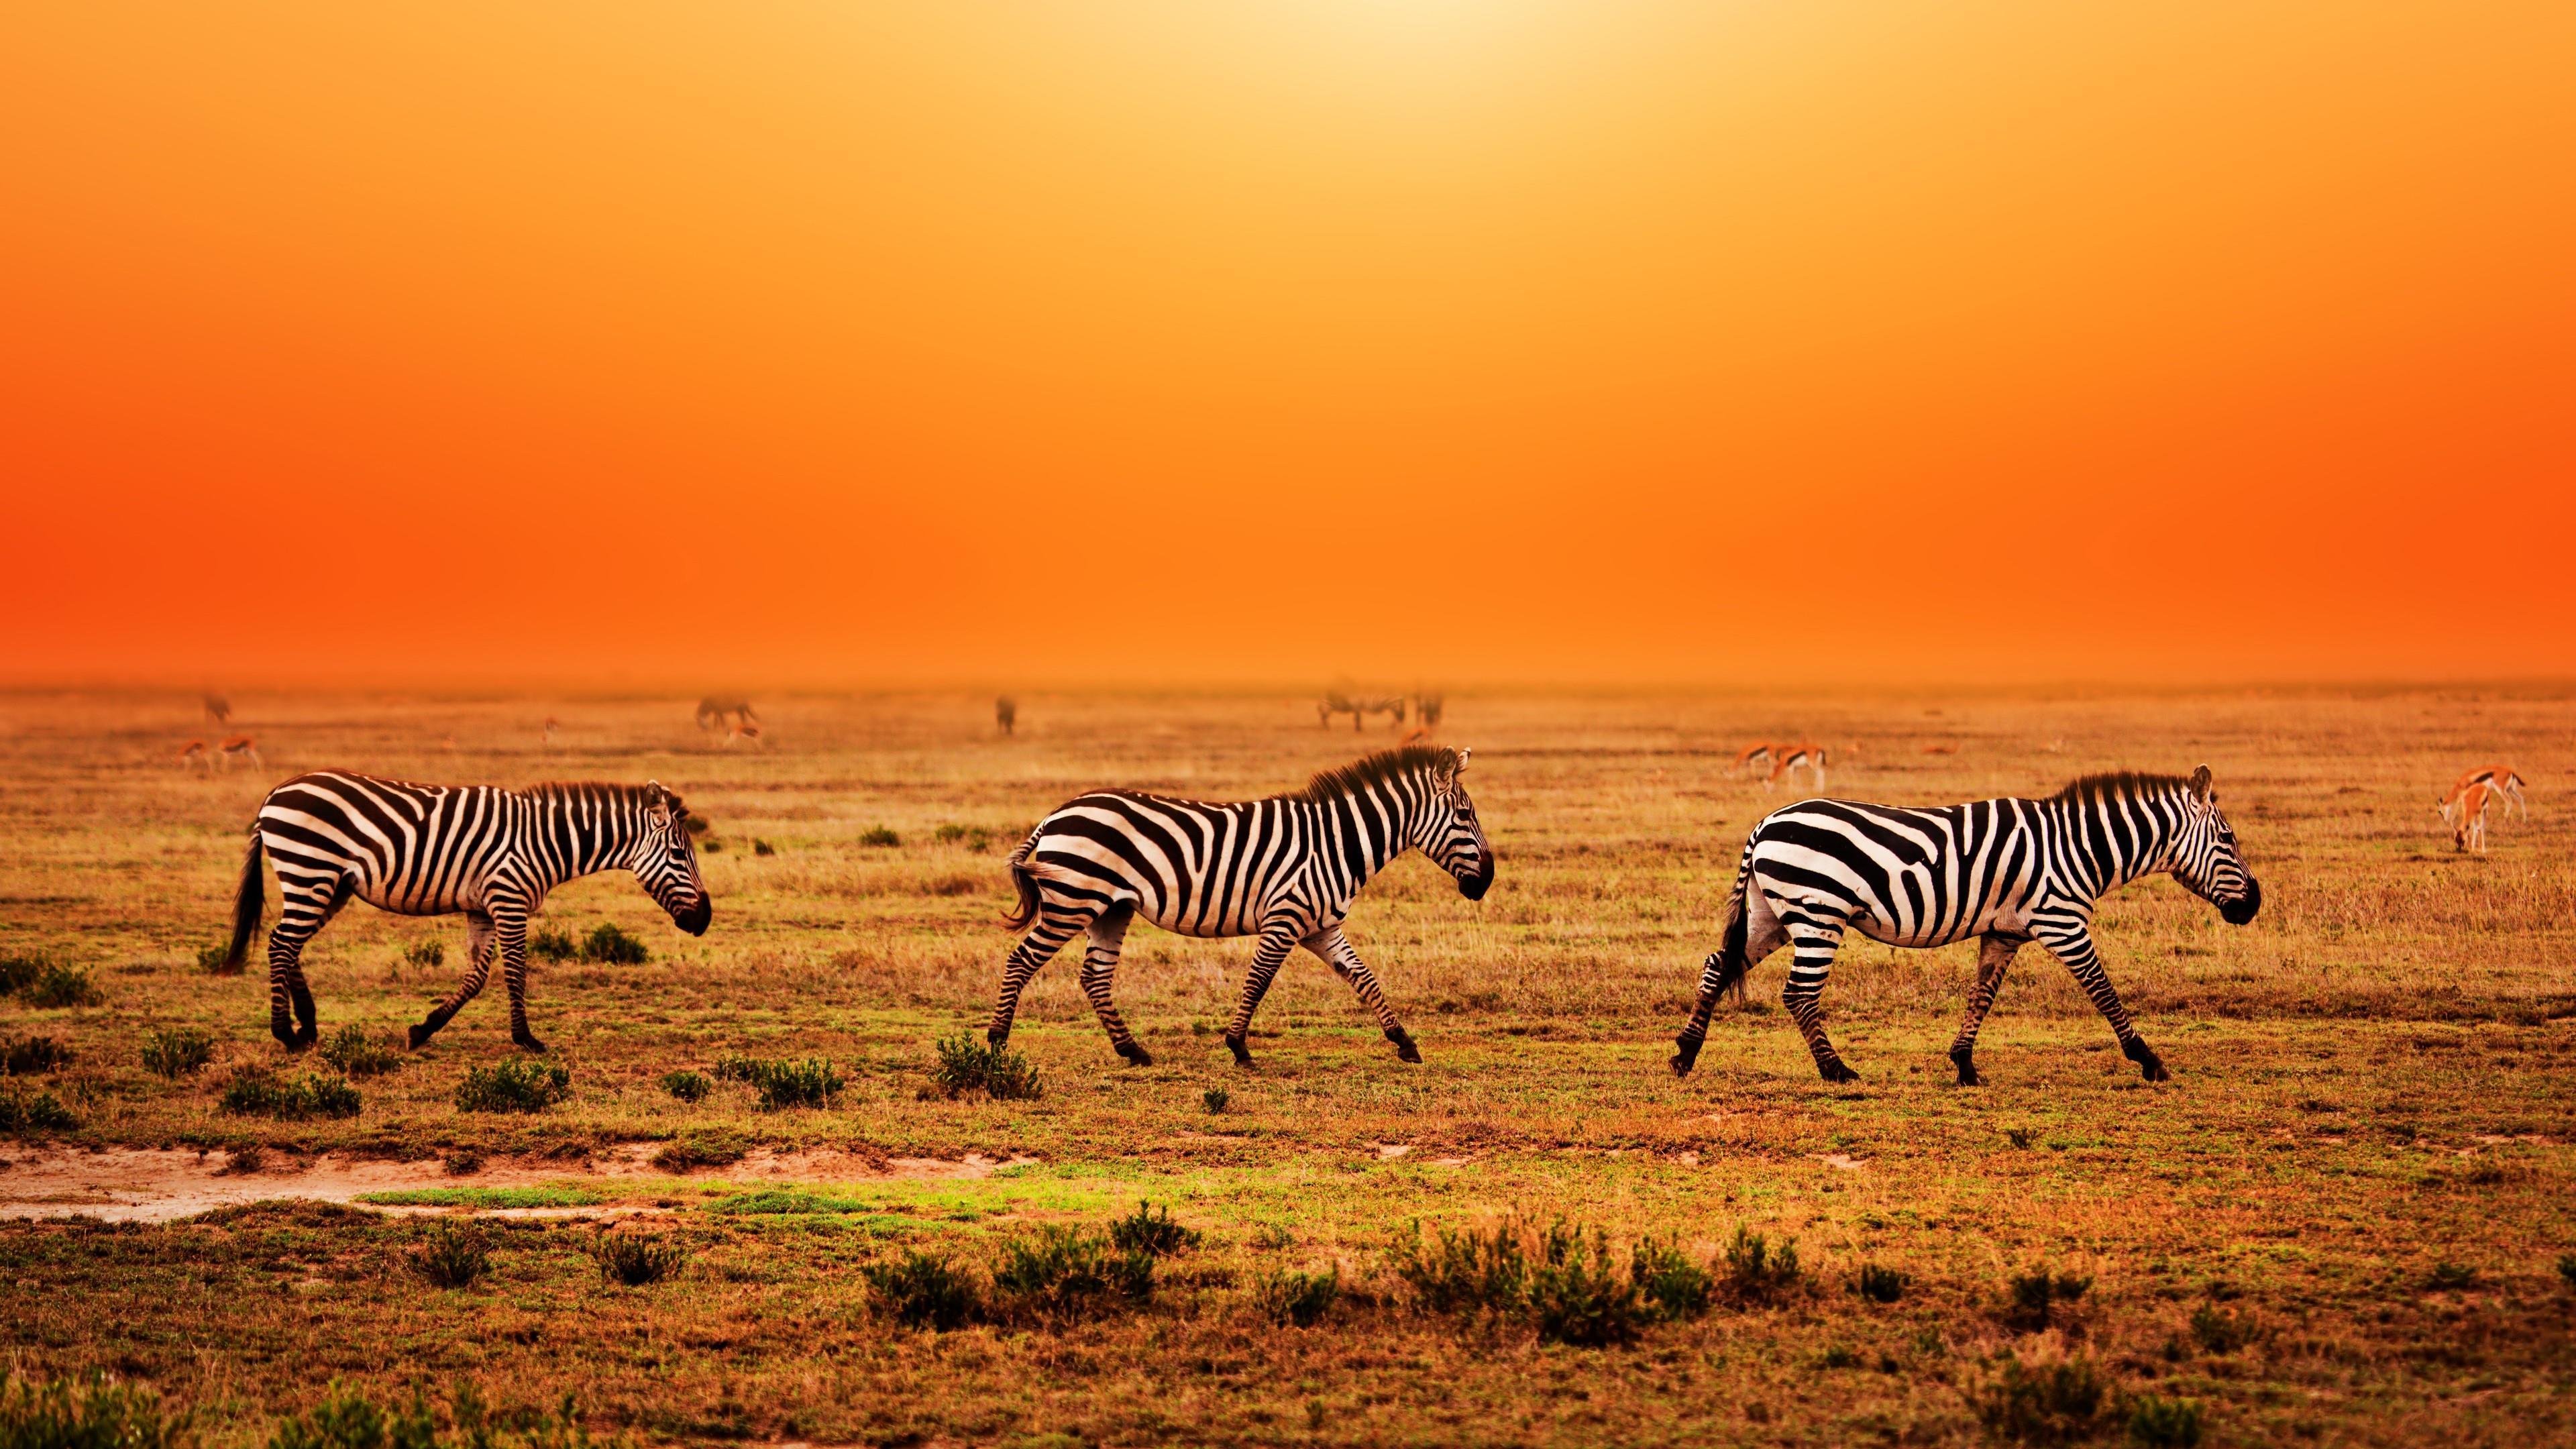 Serengeti National Park migration wallpaper